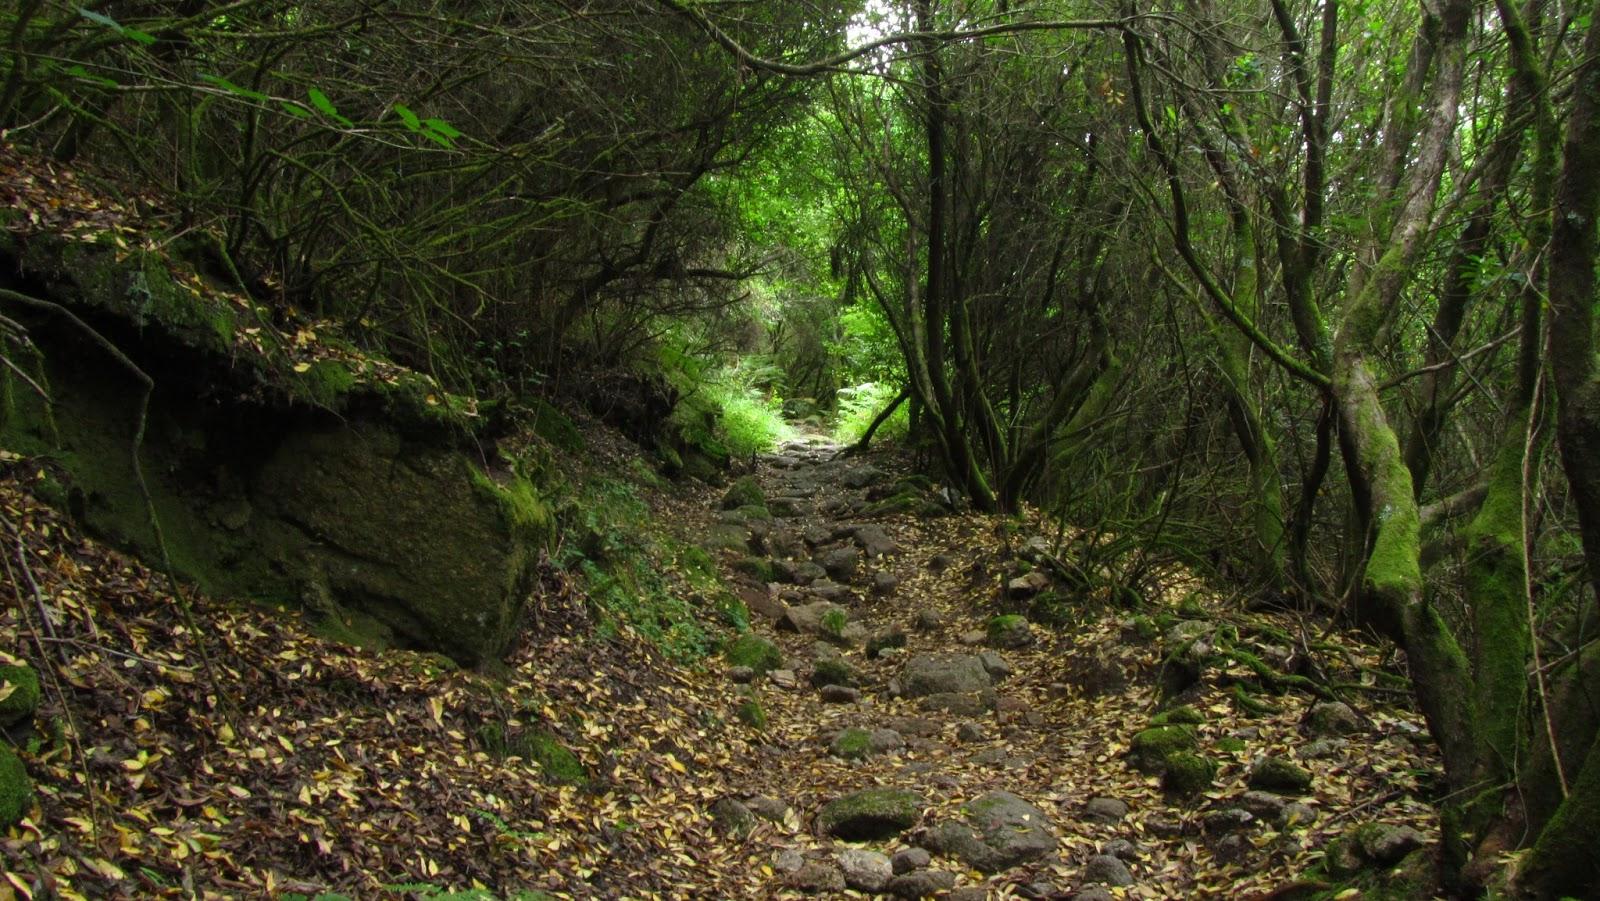 ameiseblog_ruta parque Peneda - Gerês